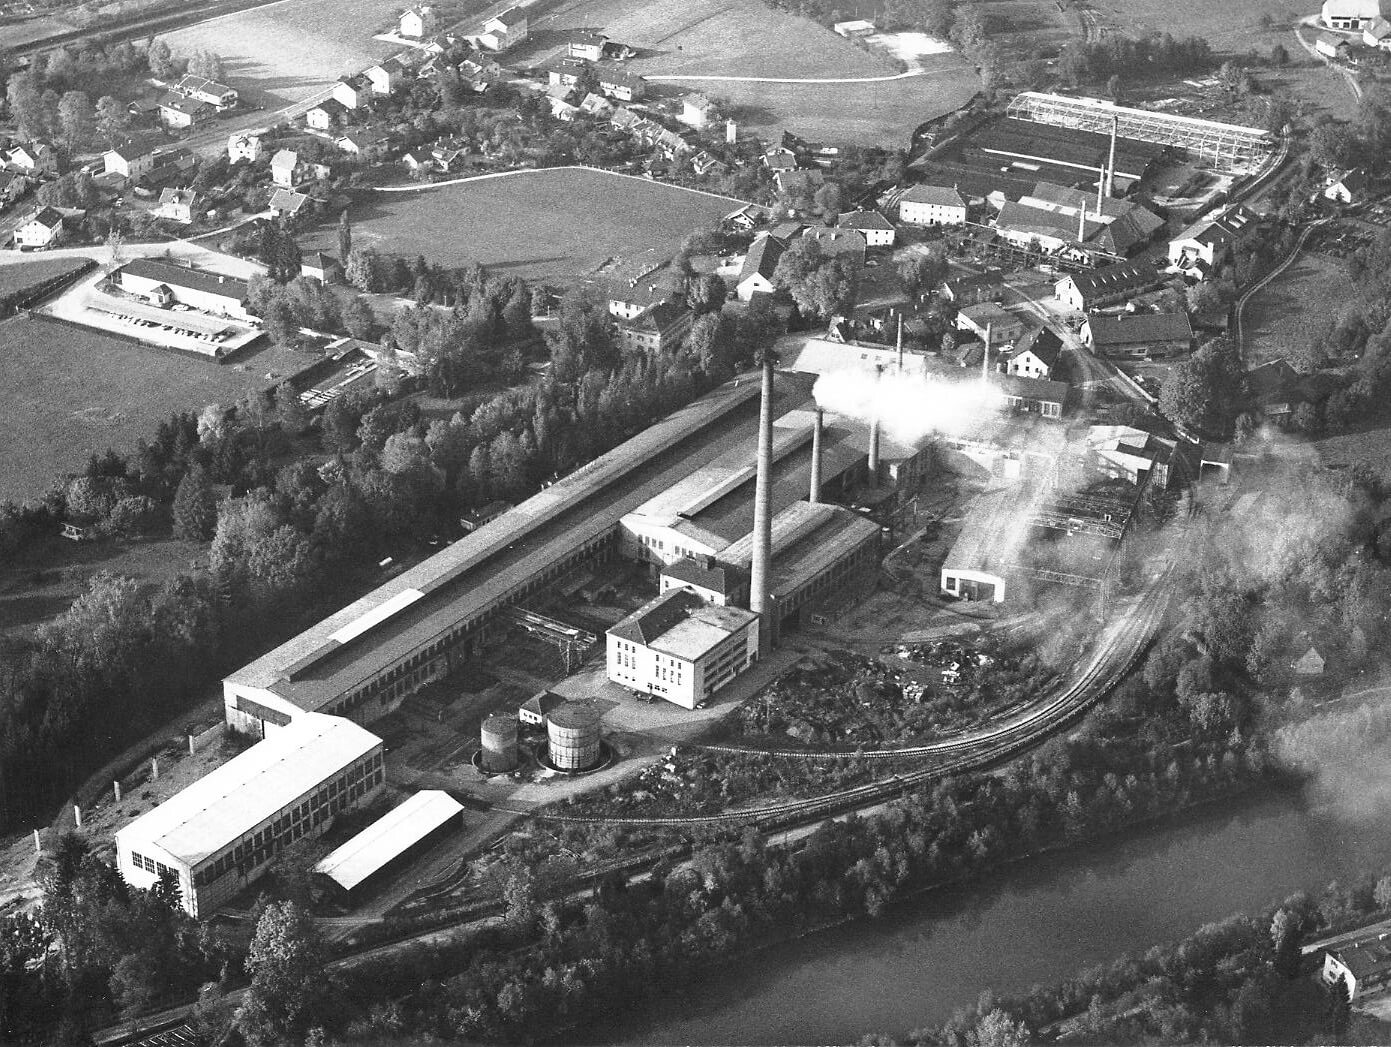 Luftaufnahme 1971